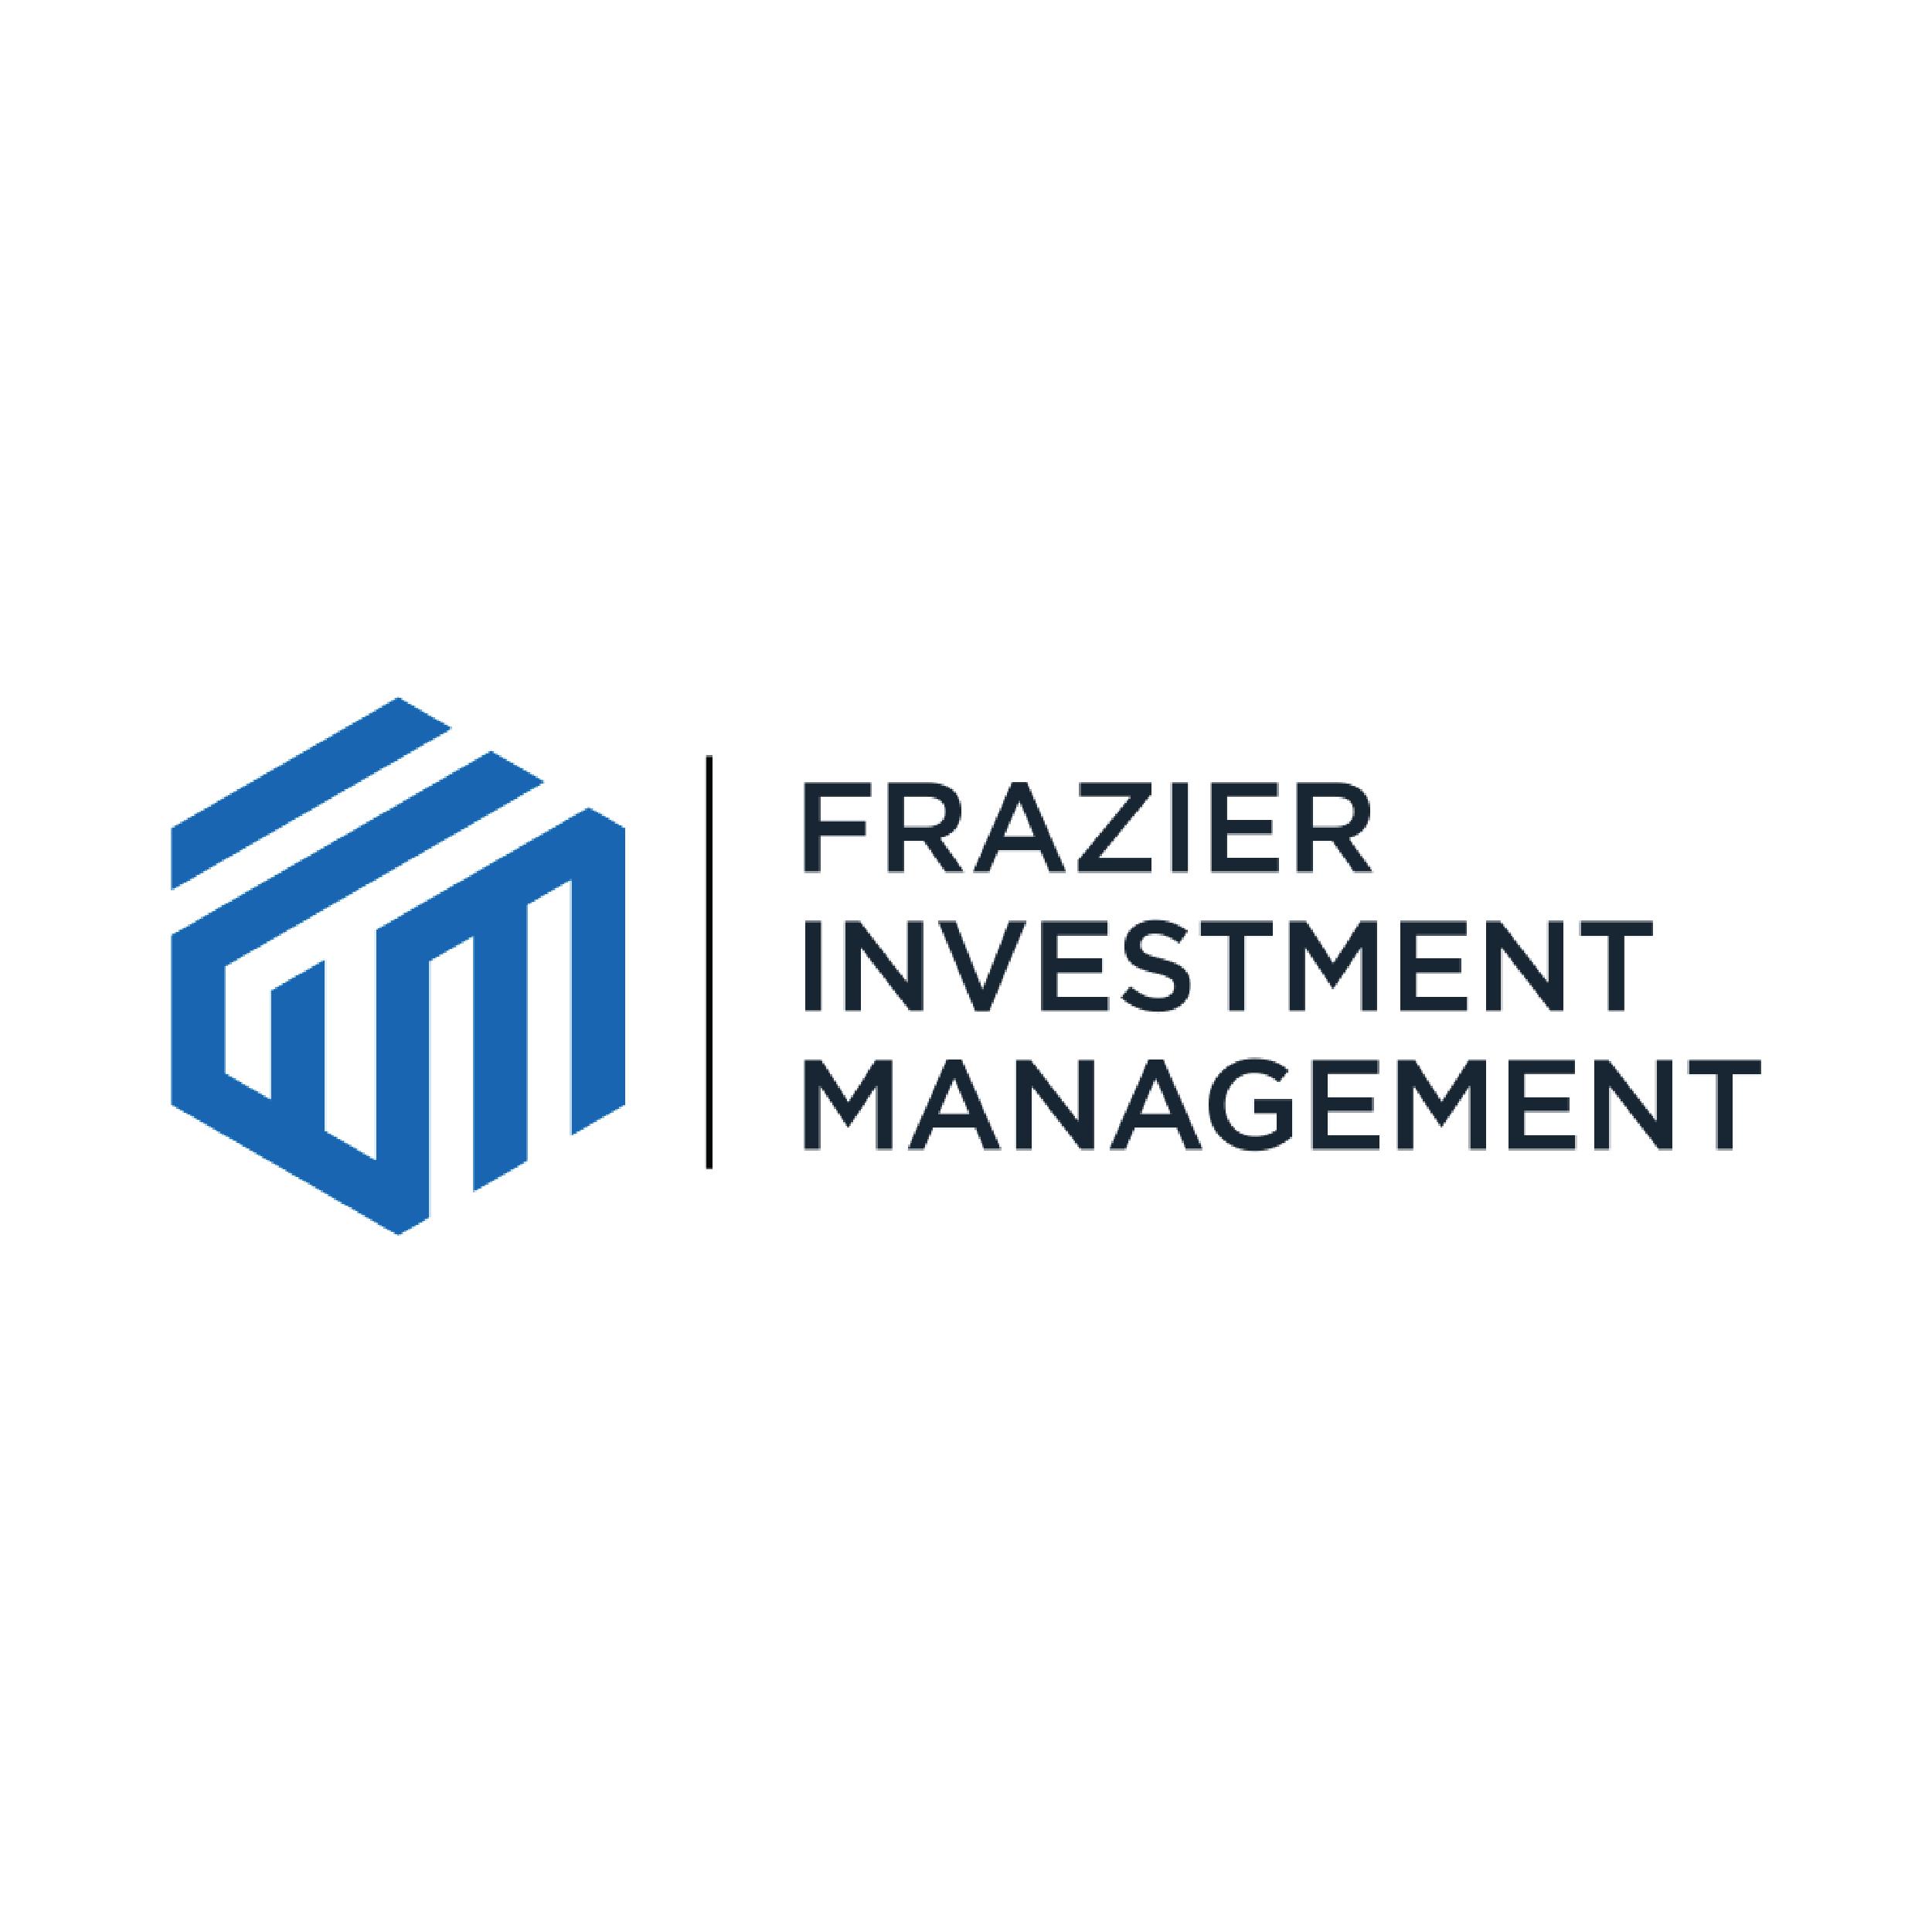 Frazier Investment